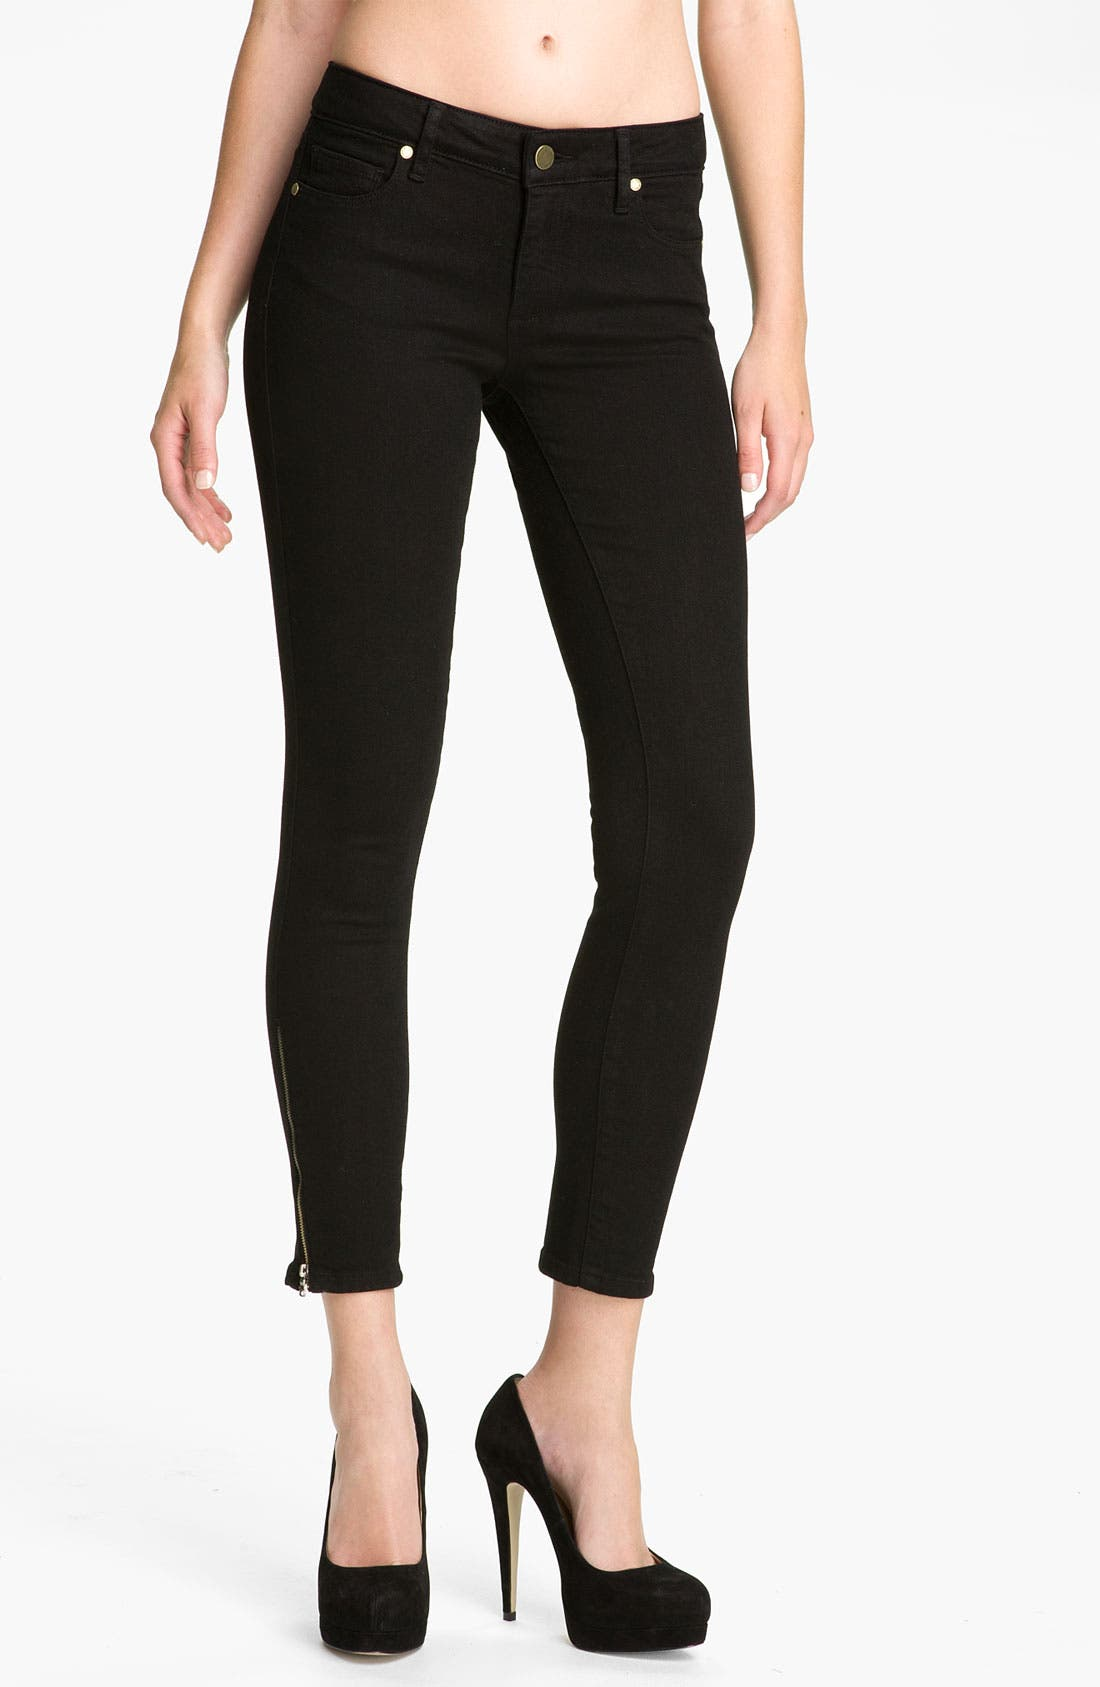 Main Image - Paige Denim 'Verdugo' Ankle Zip Skinny Stretch Jeans (Black Ink)